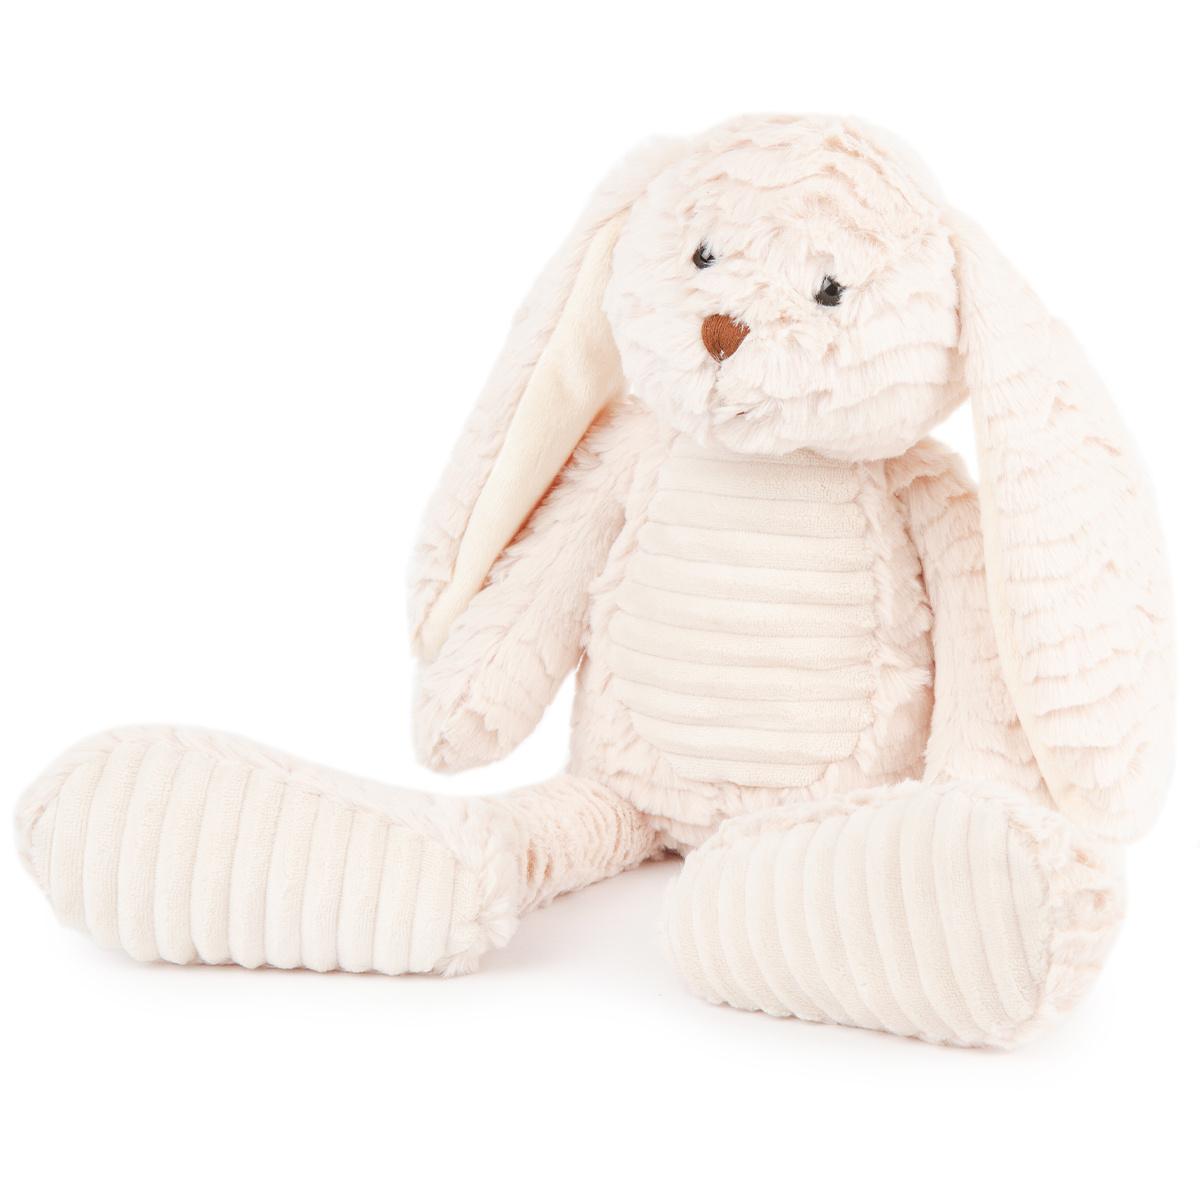 BO-MA Trading Plyšový králik dlhý, 54 cm